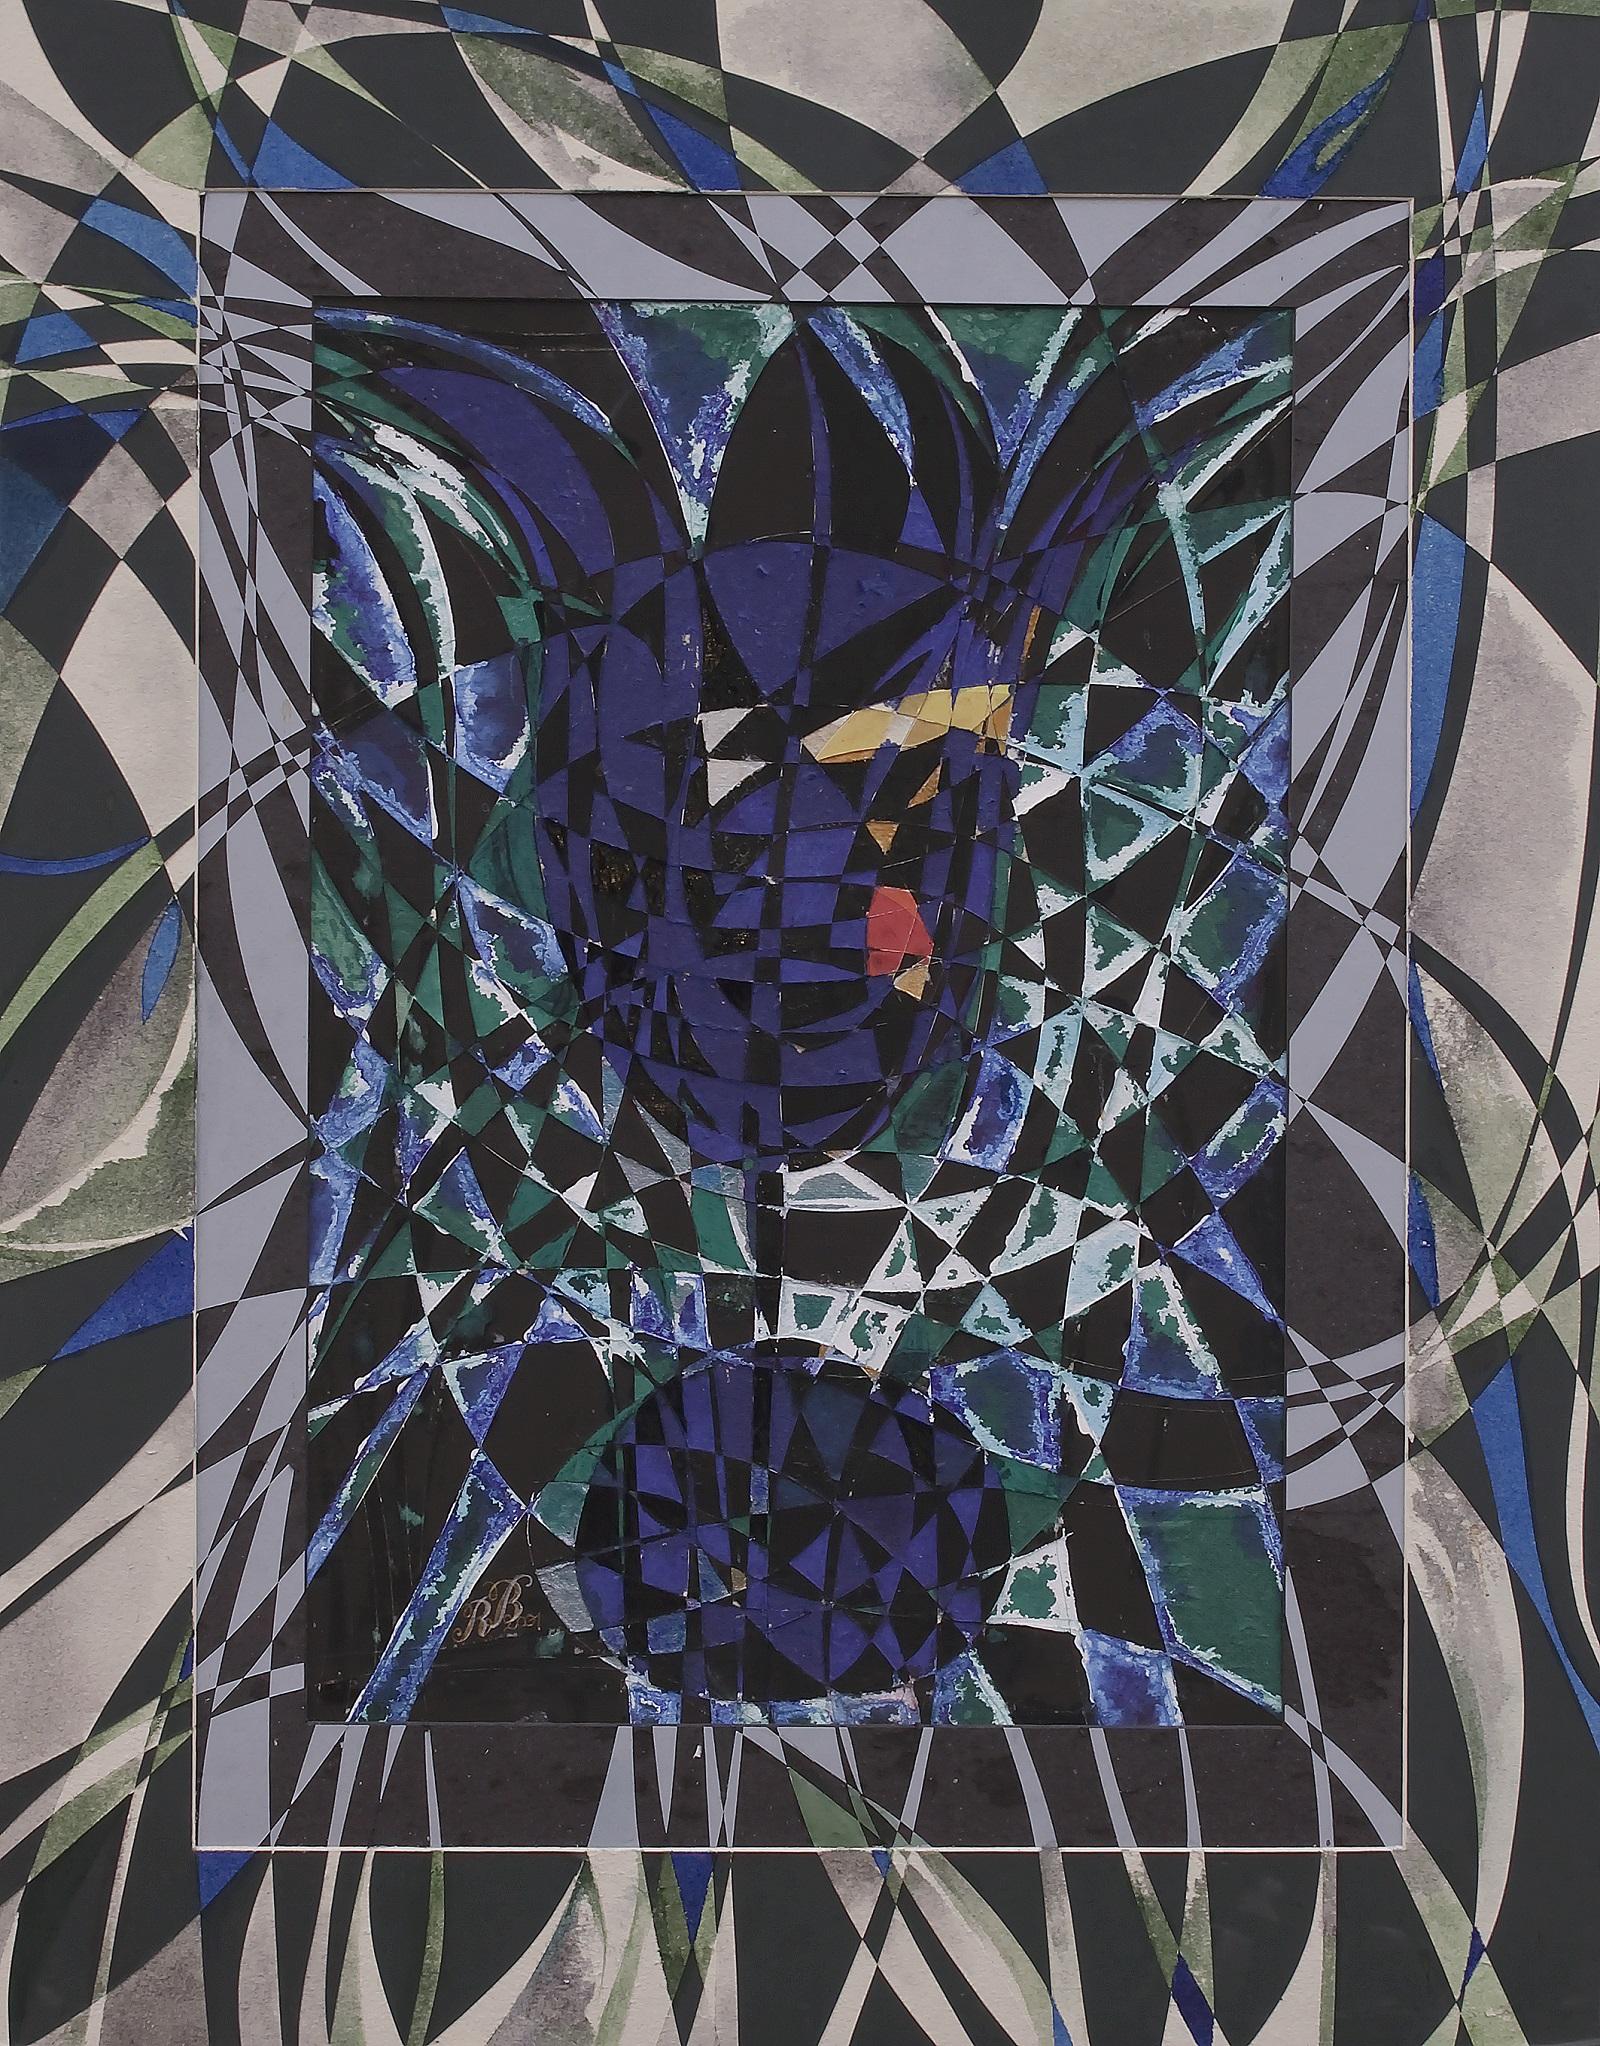 """My evening glass"" Rumyanka Bozhkova Drawing Engraving on Multilayer Cardboard"